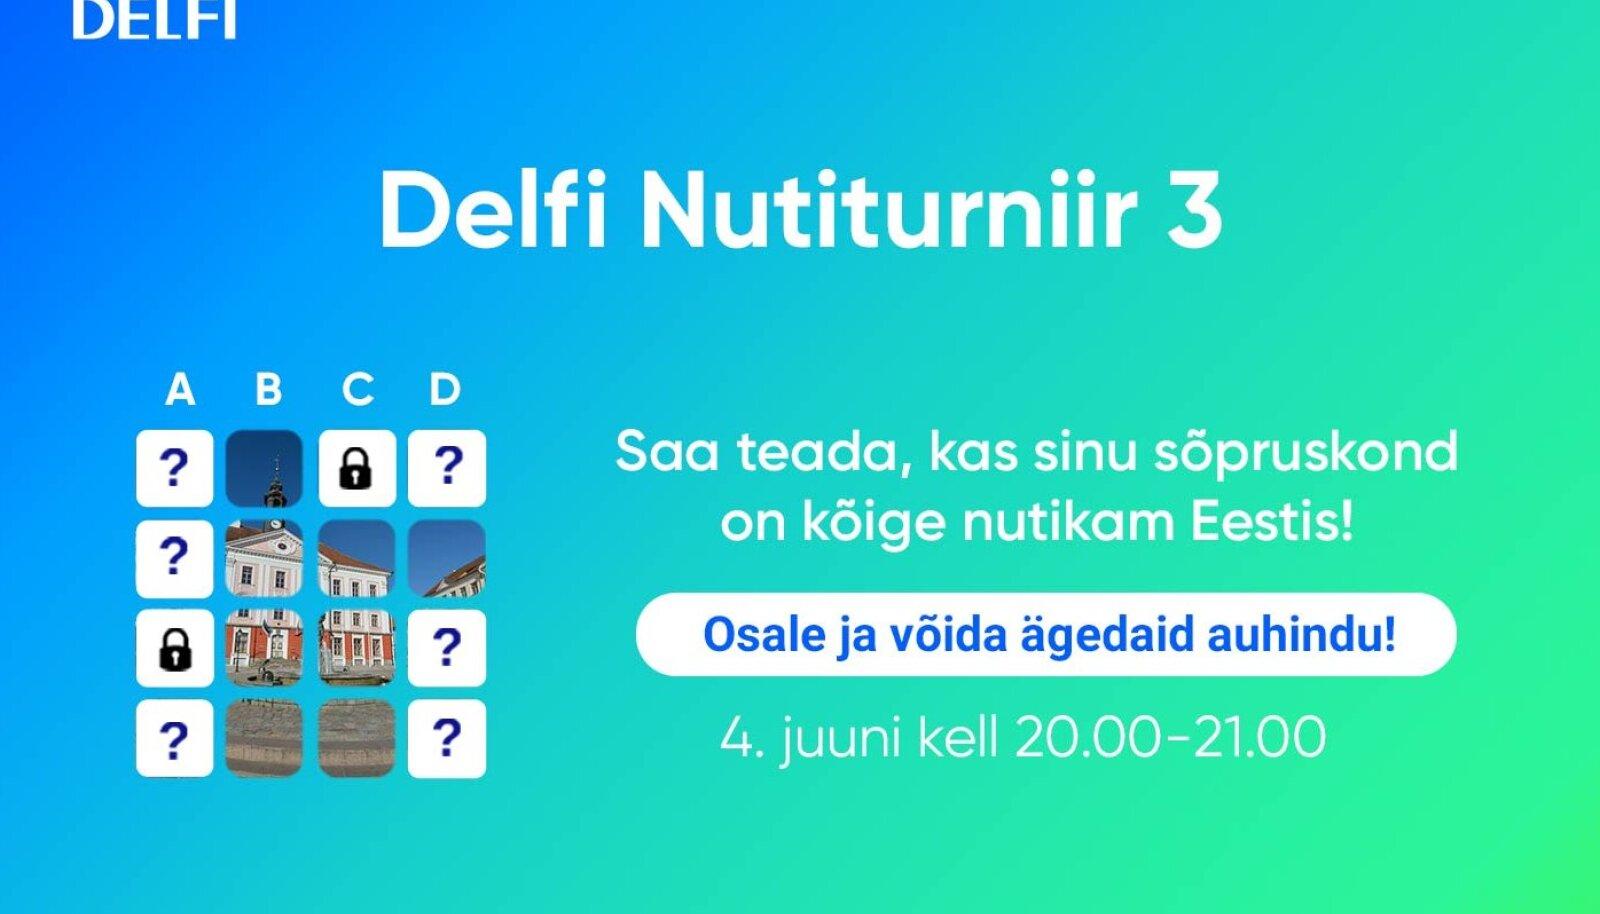 Delfi Nutiturniir